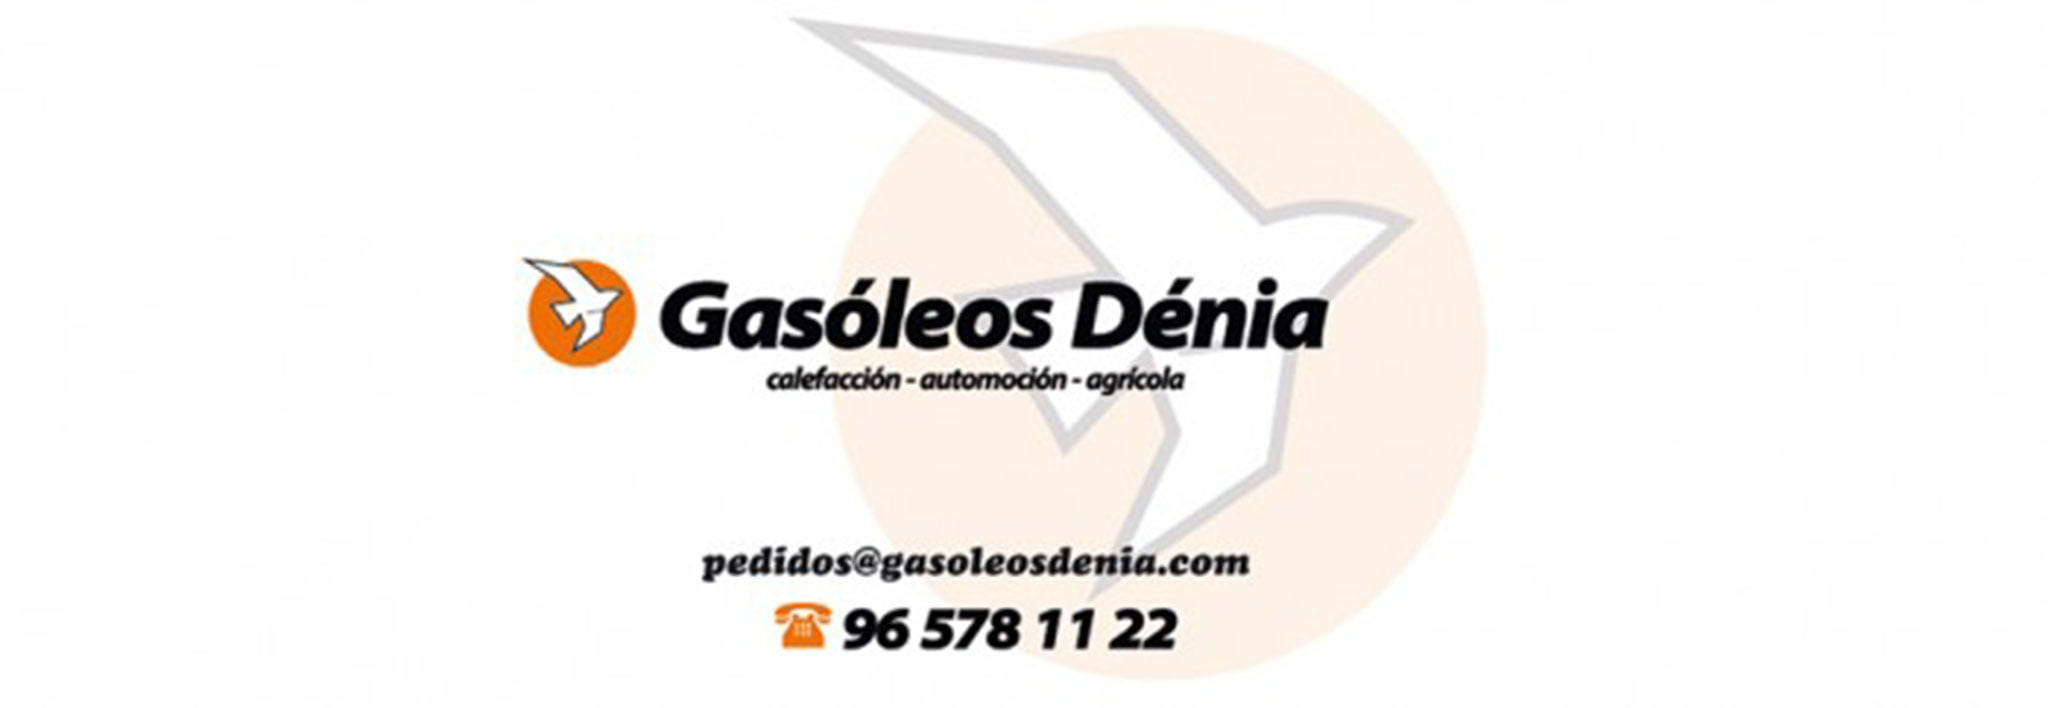 Gasóleos Dénia logo